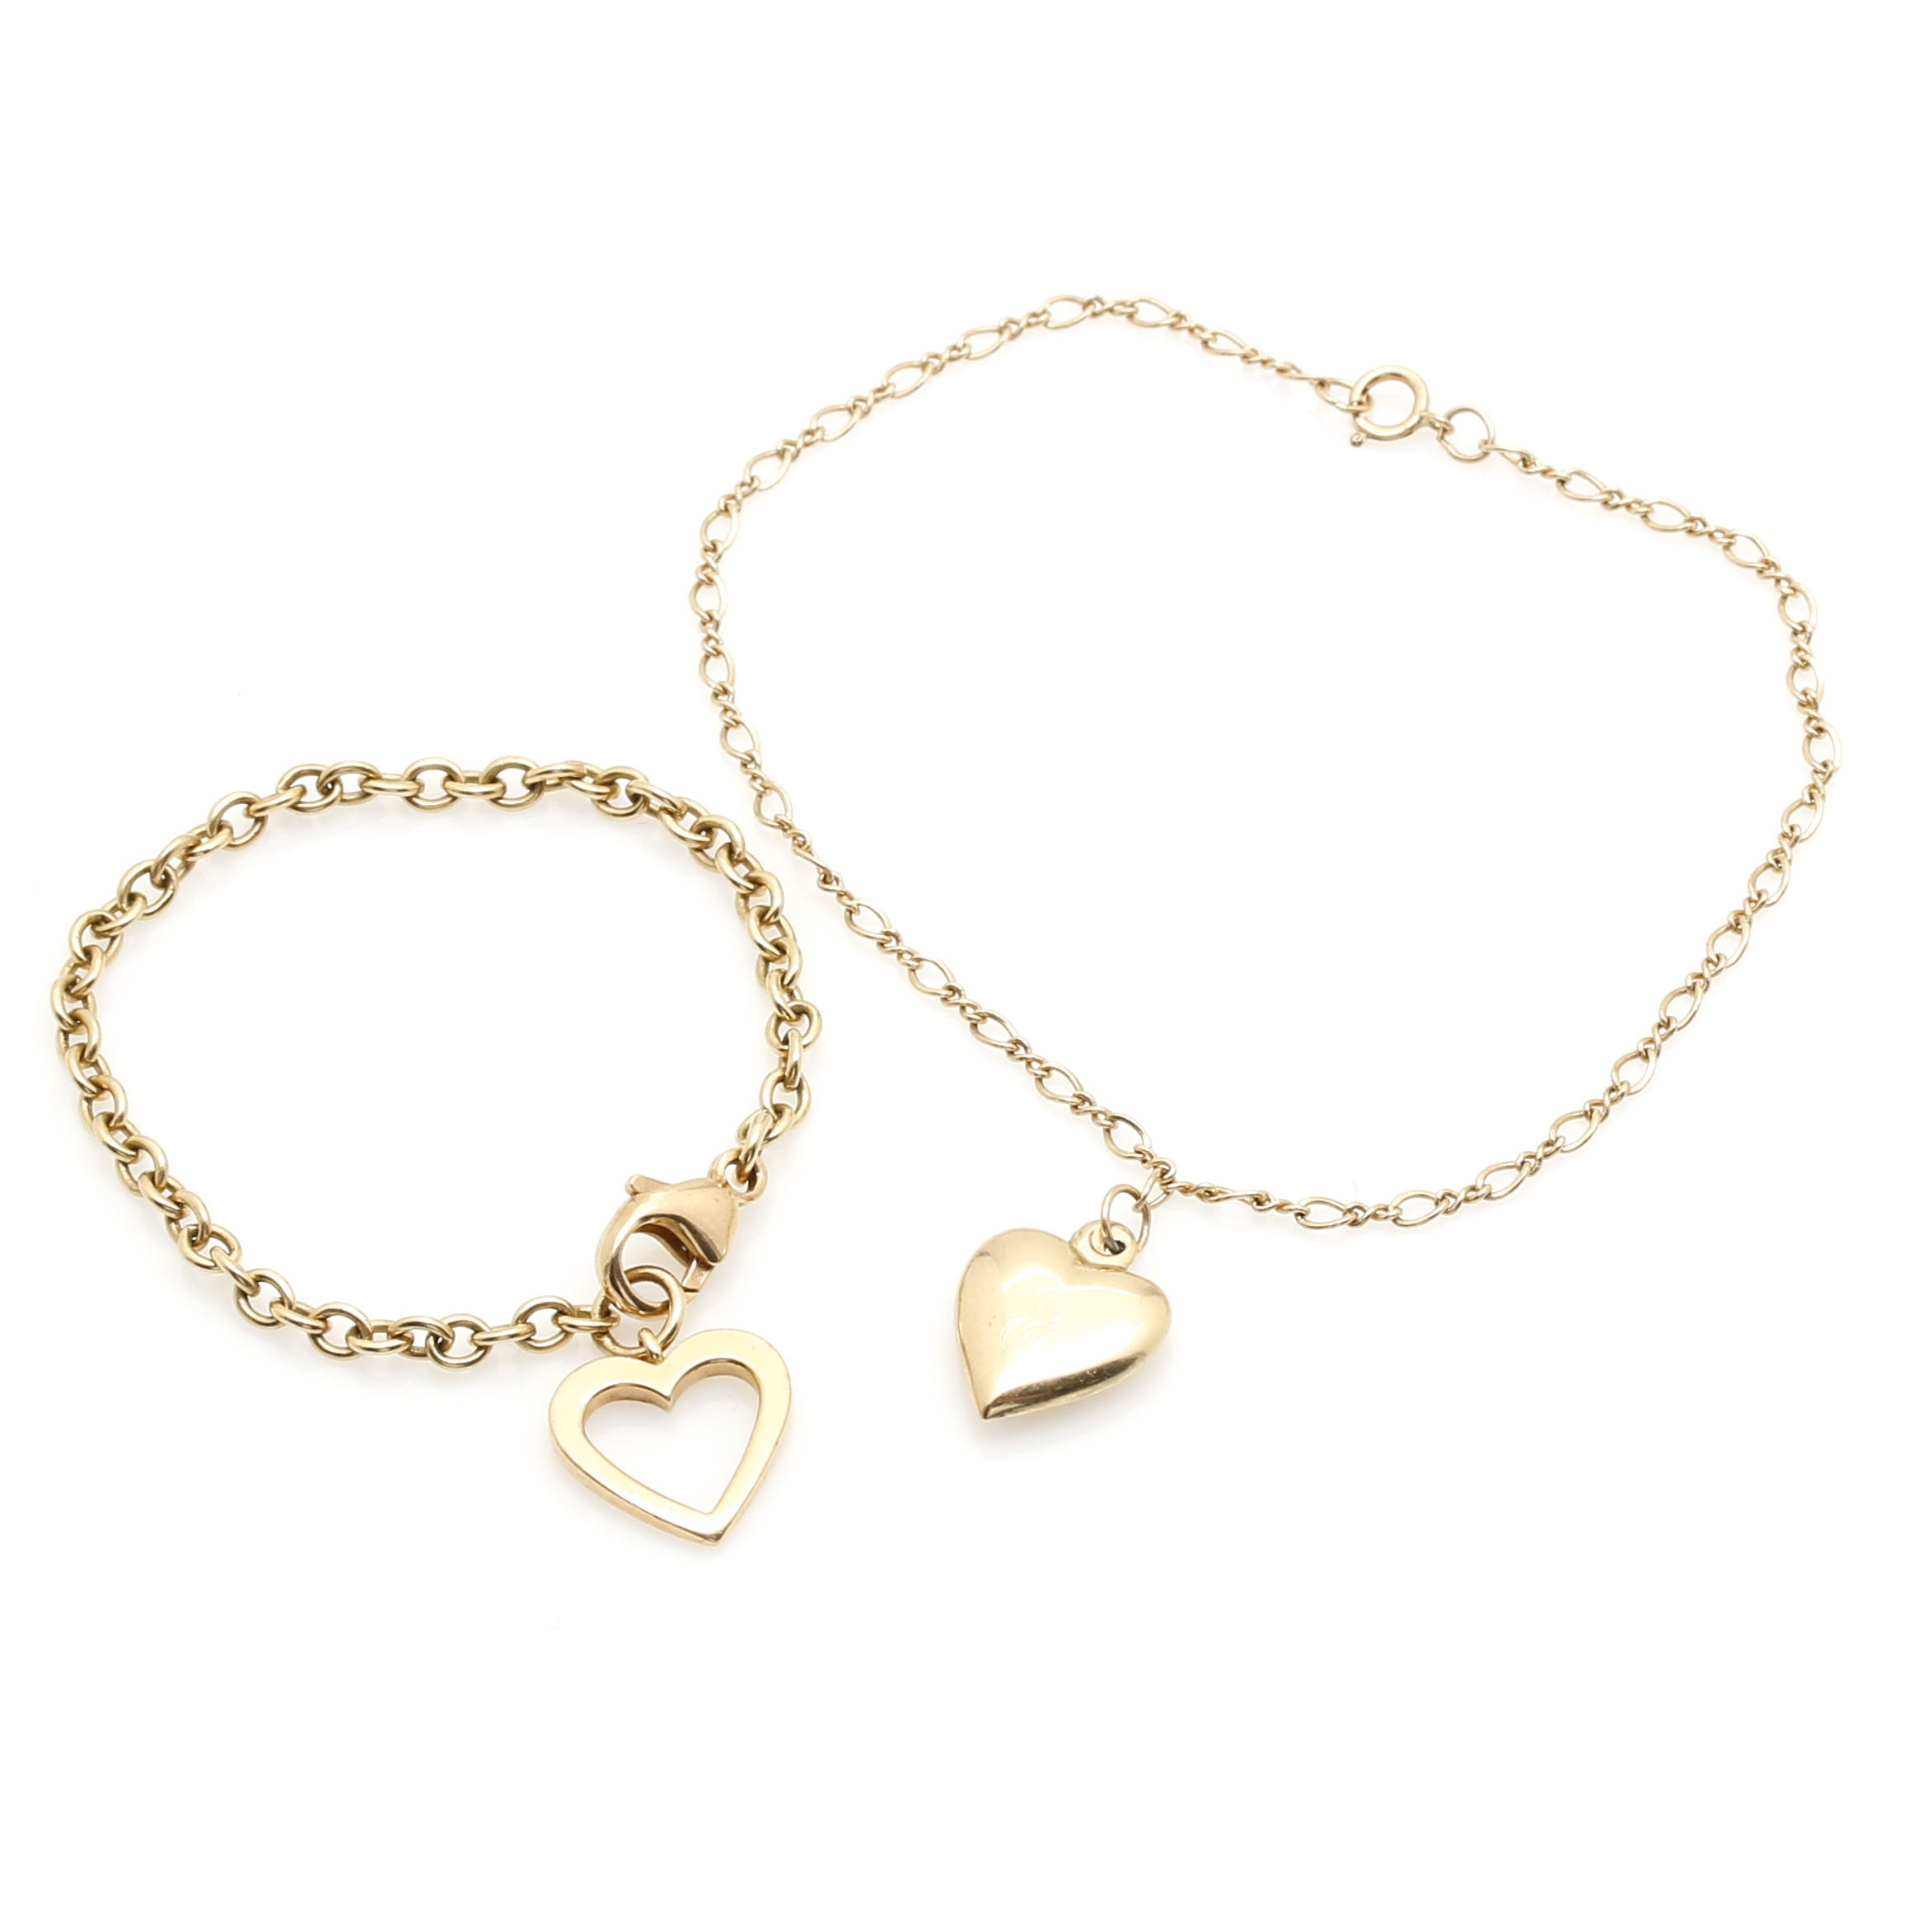 14K Yellow Gold Heart Charm Bracelets